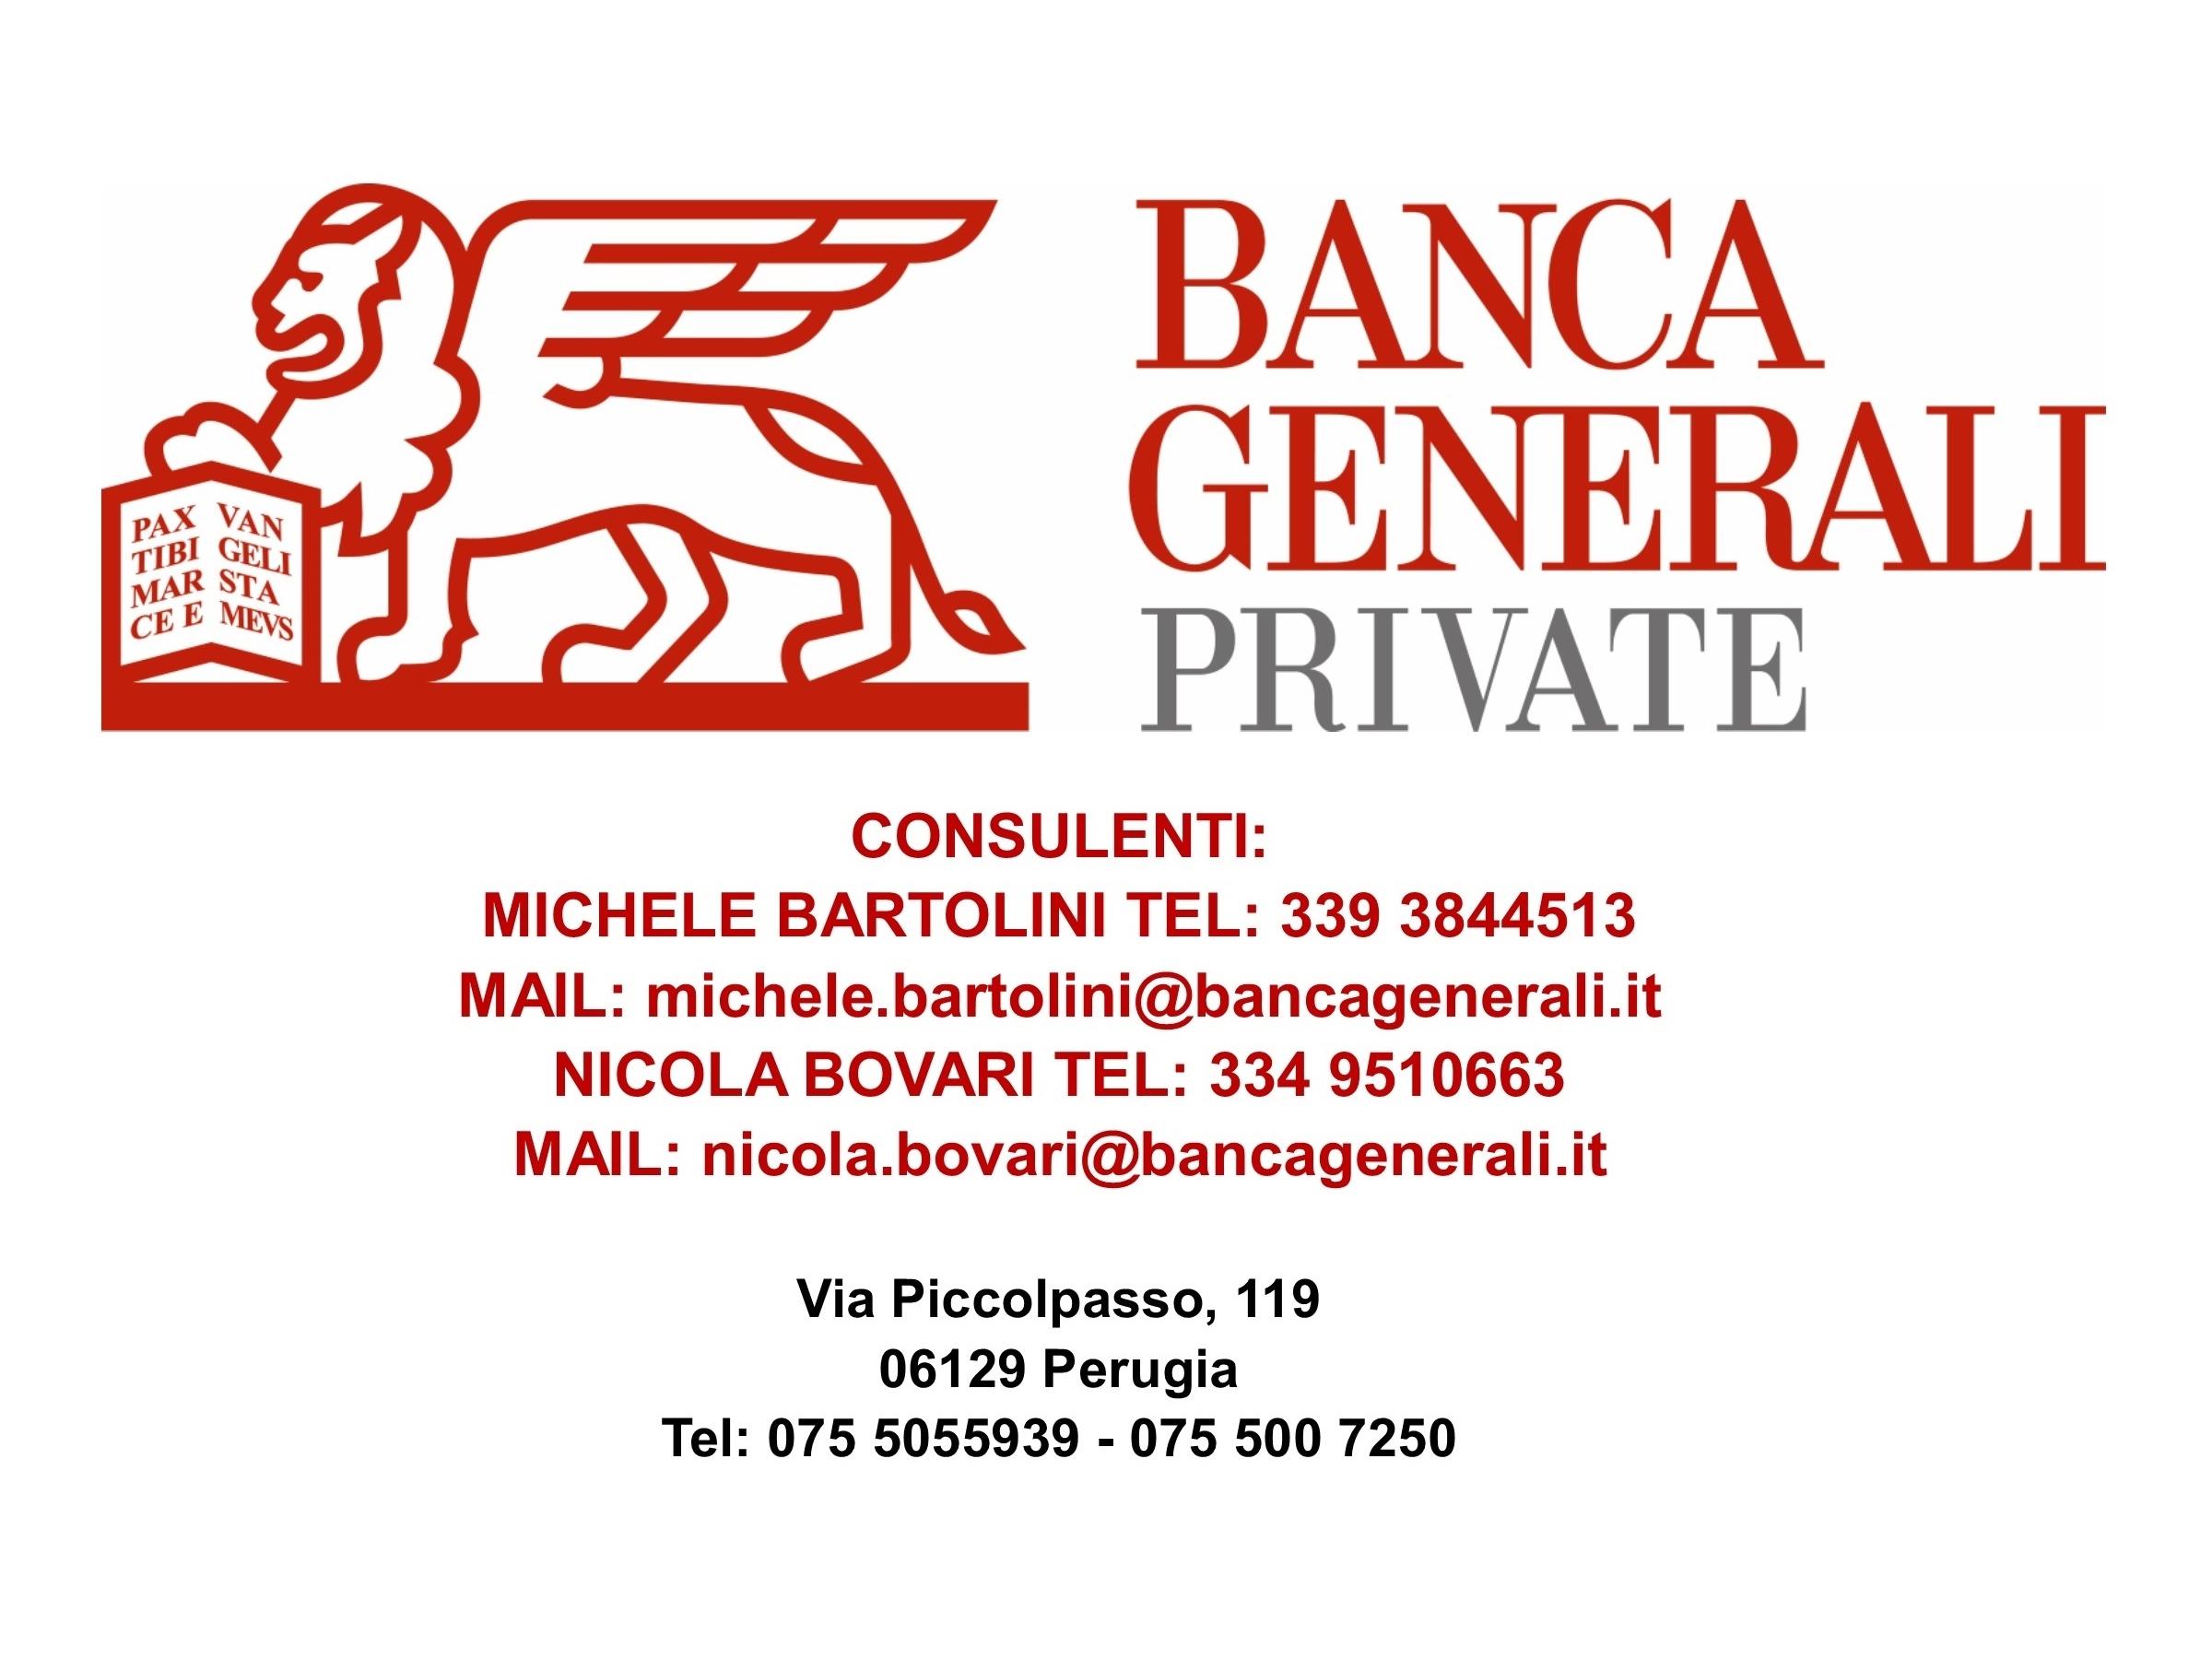 Banca-Generali-Private